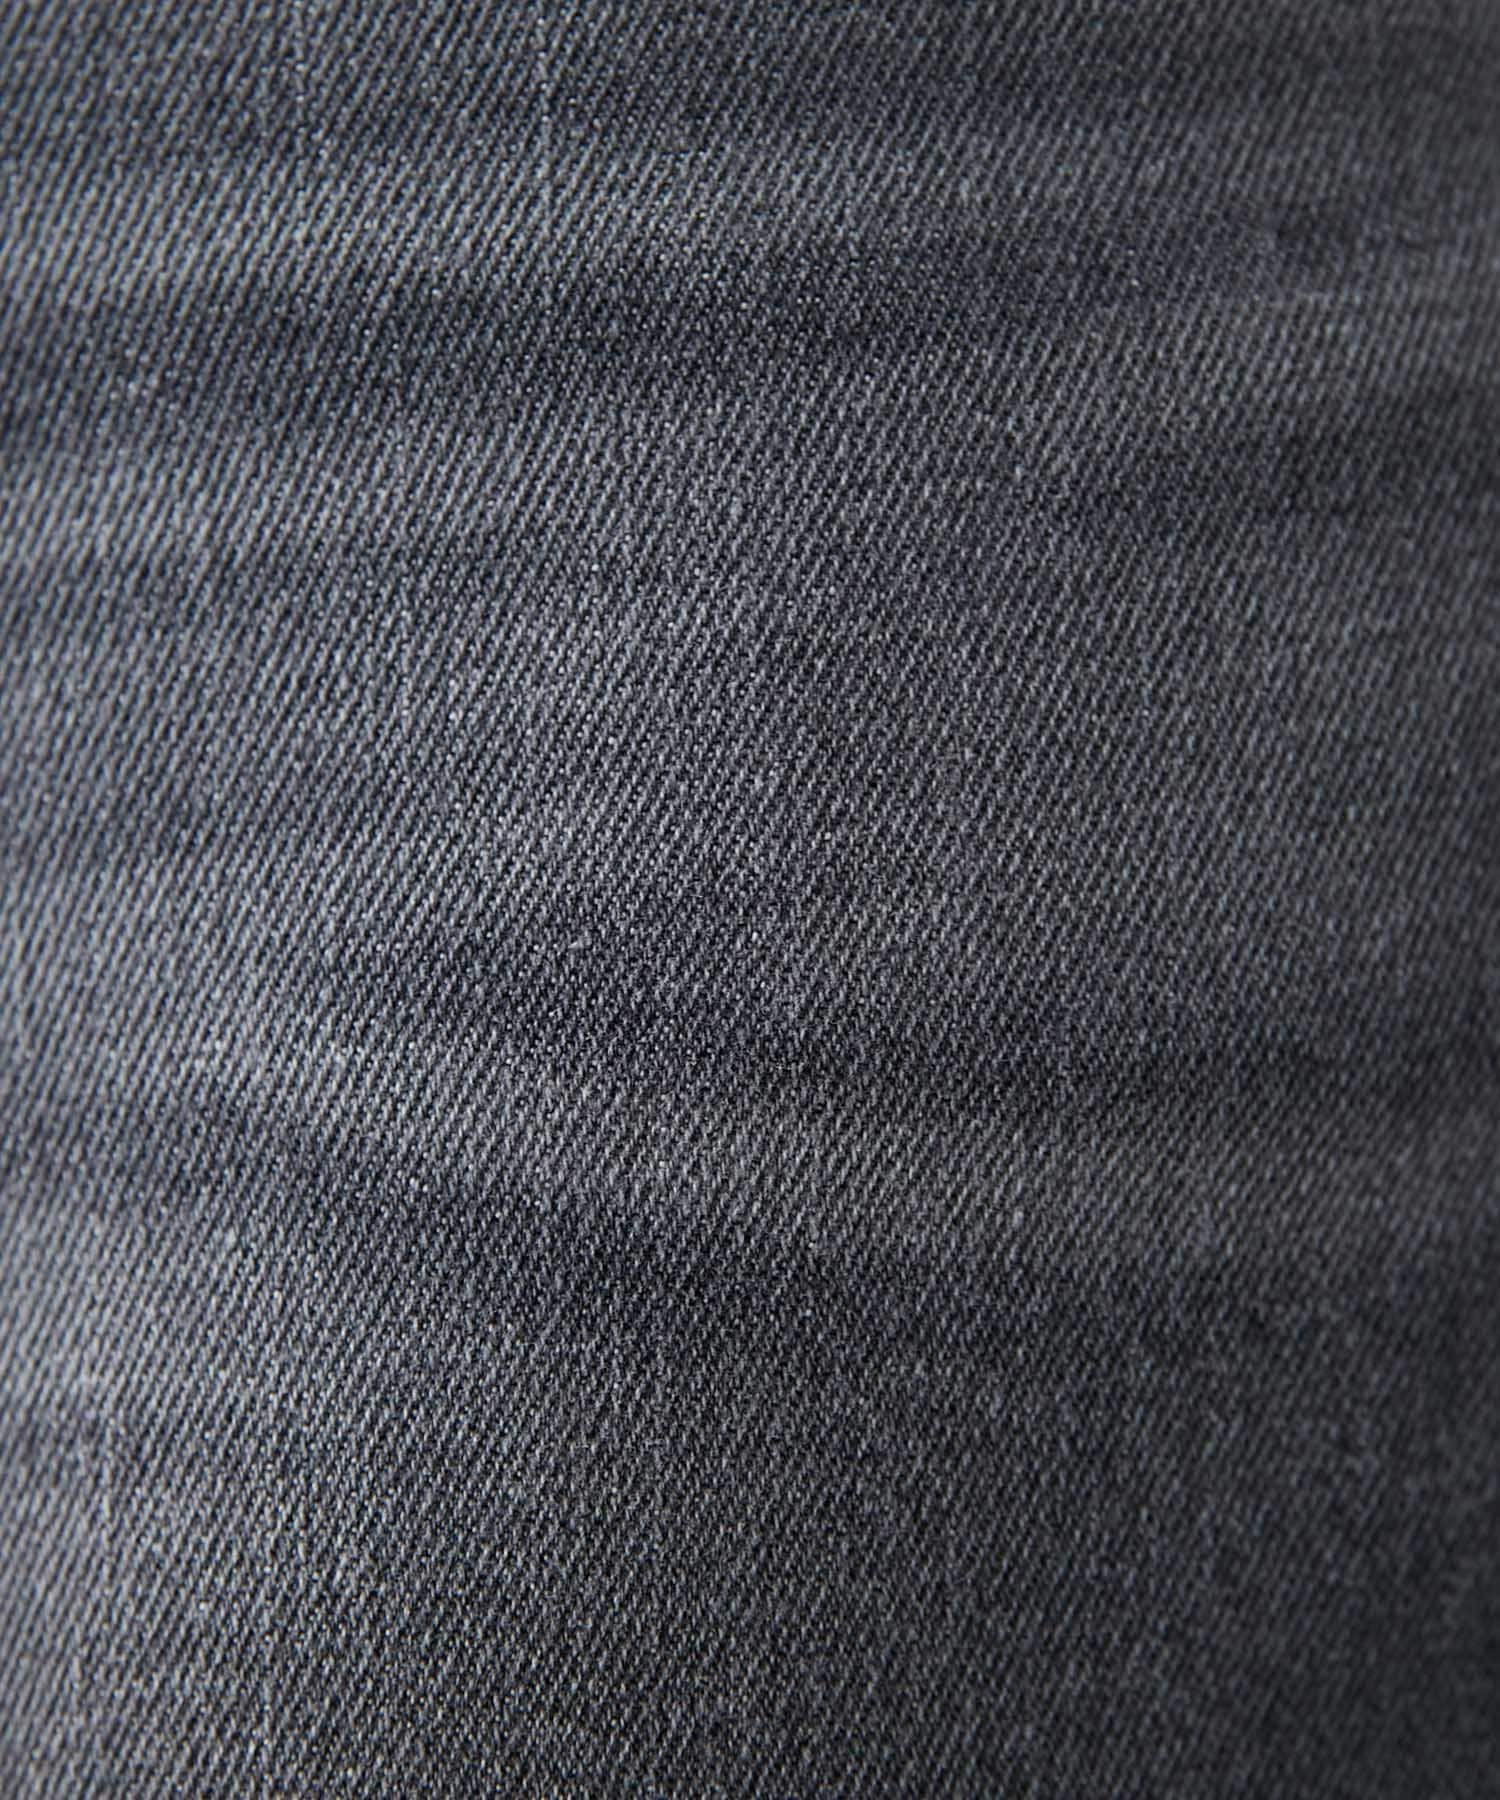 BONbazaar(ボンバザール) オリジナルセミフレアデニム